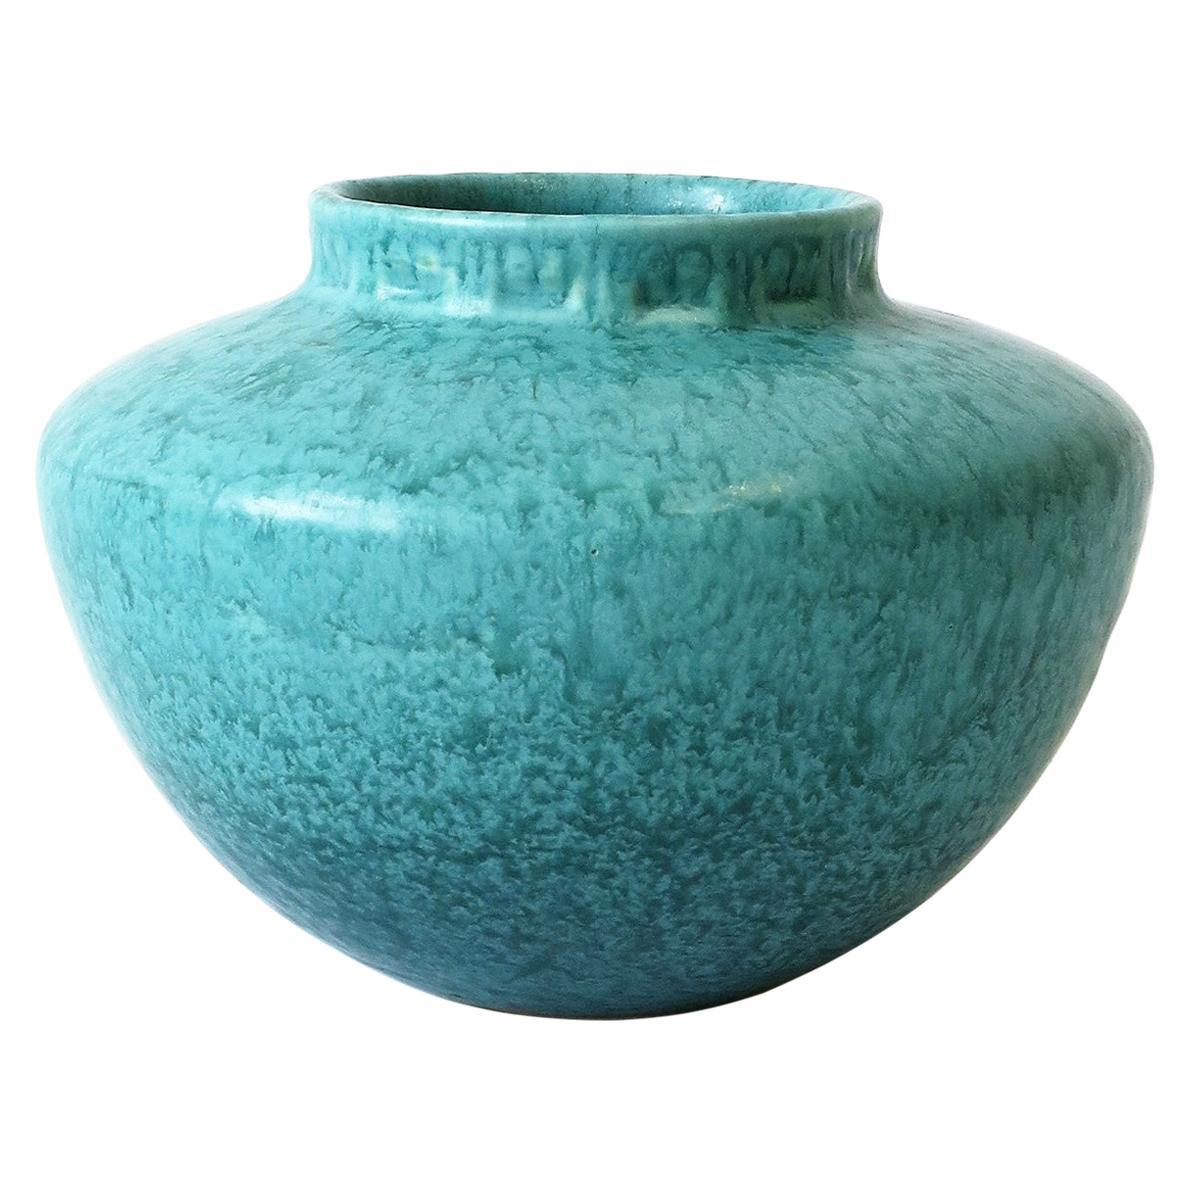 Mid-Century Modern Turquoise Blue Pottery Vase, circa 1960s